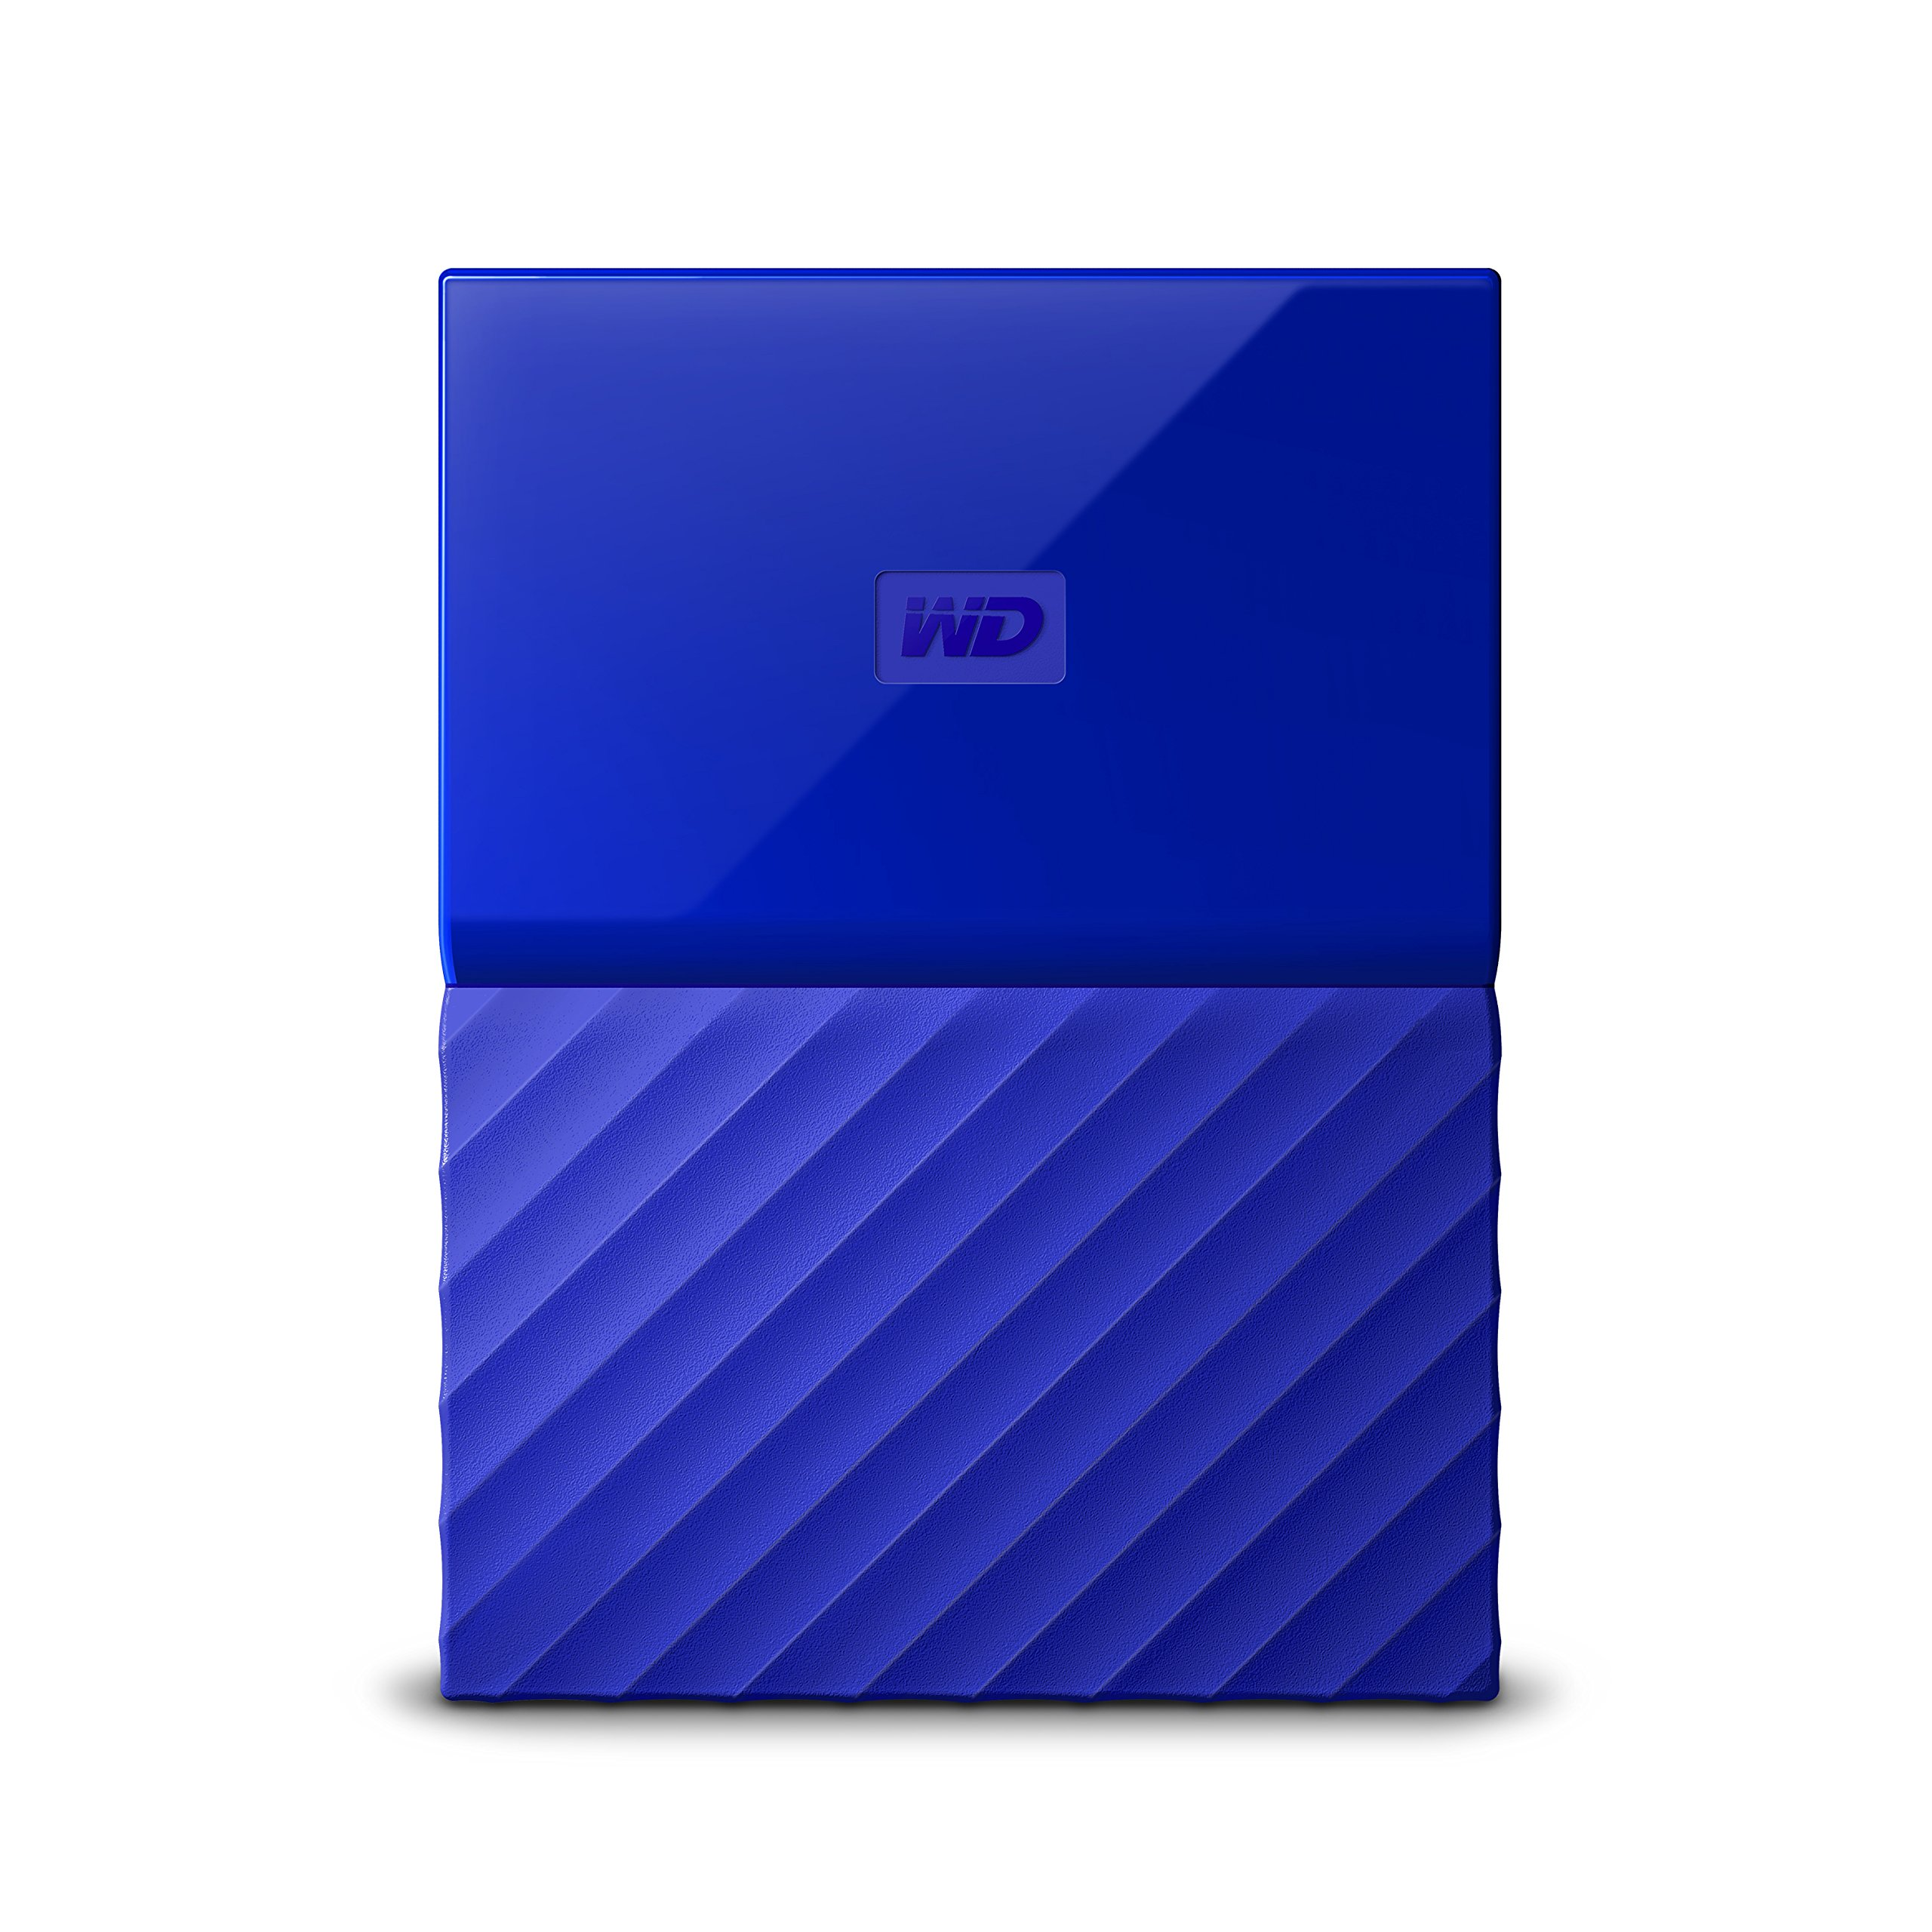 WD 2TB Blue My Passport Portable External Hard Drive - USB 3.0 - WDBYFT0020BBL-WESN by Western Digital